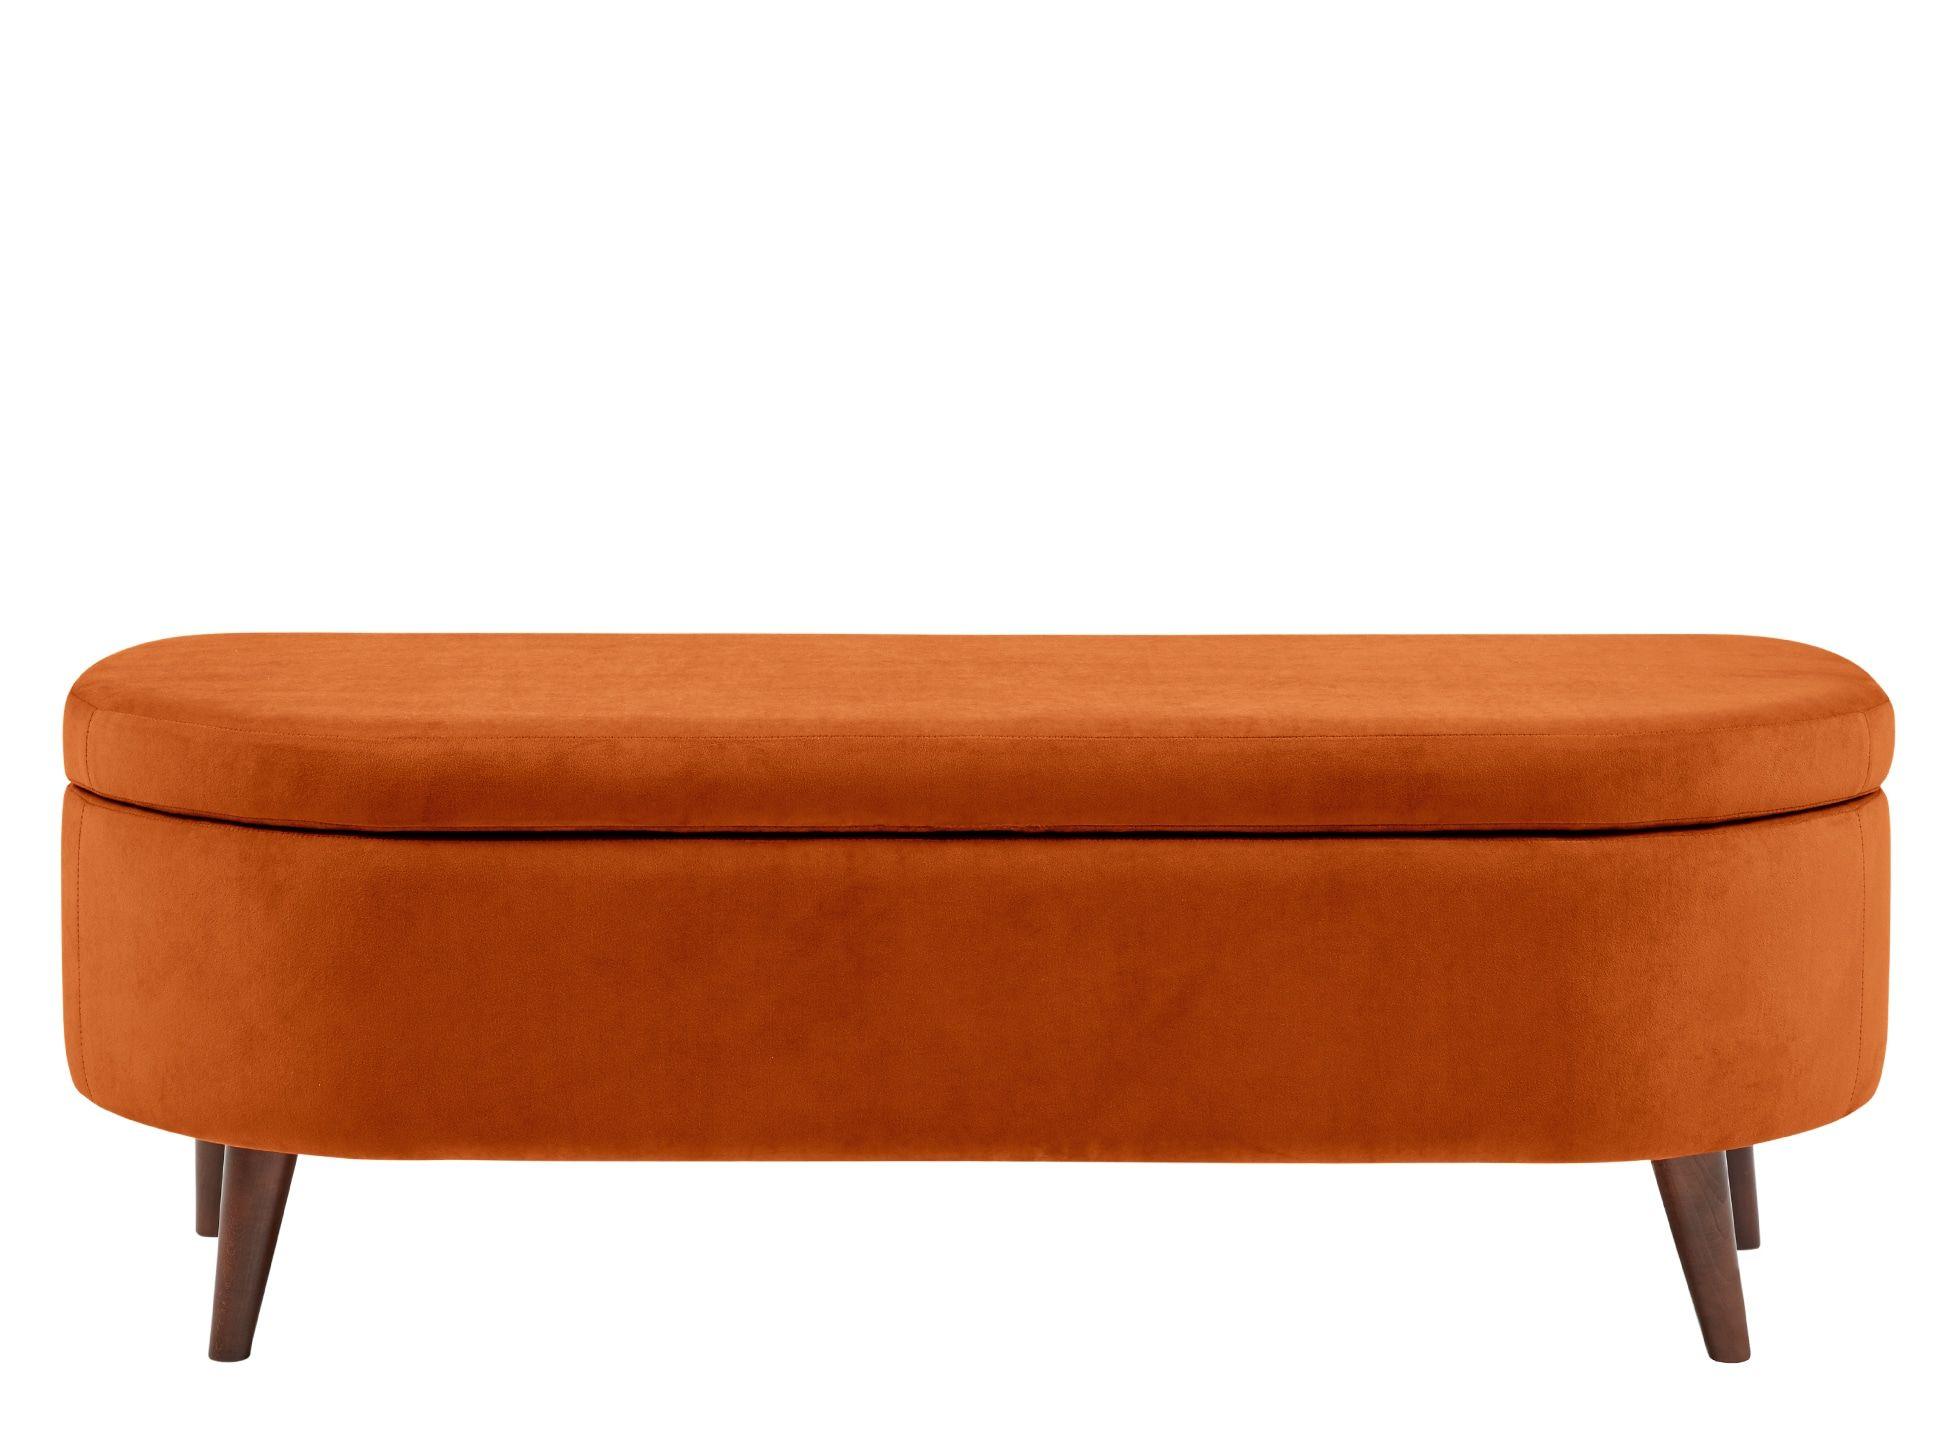 Lulu Ottoman Bench Paprika Orange Velvet Ottoman Bench Ottoman Storage Bench